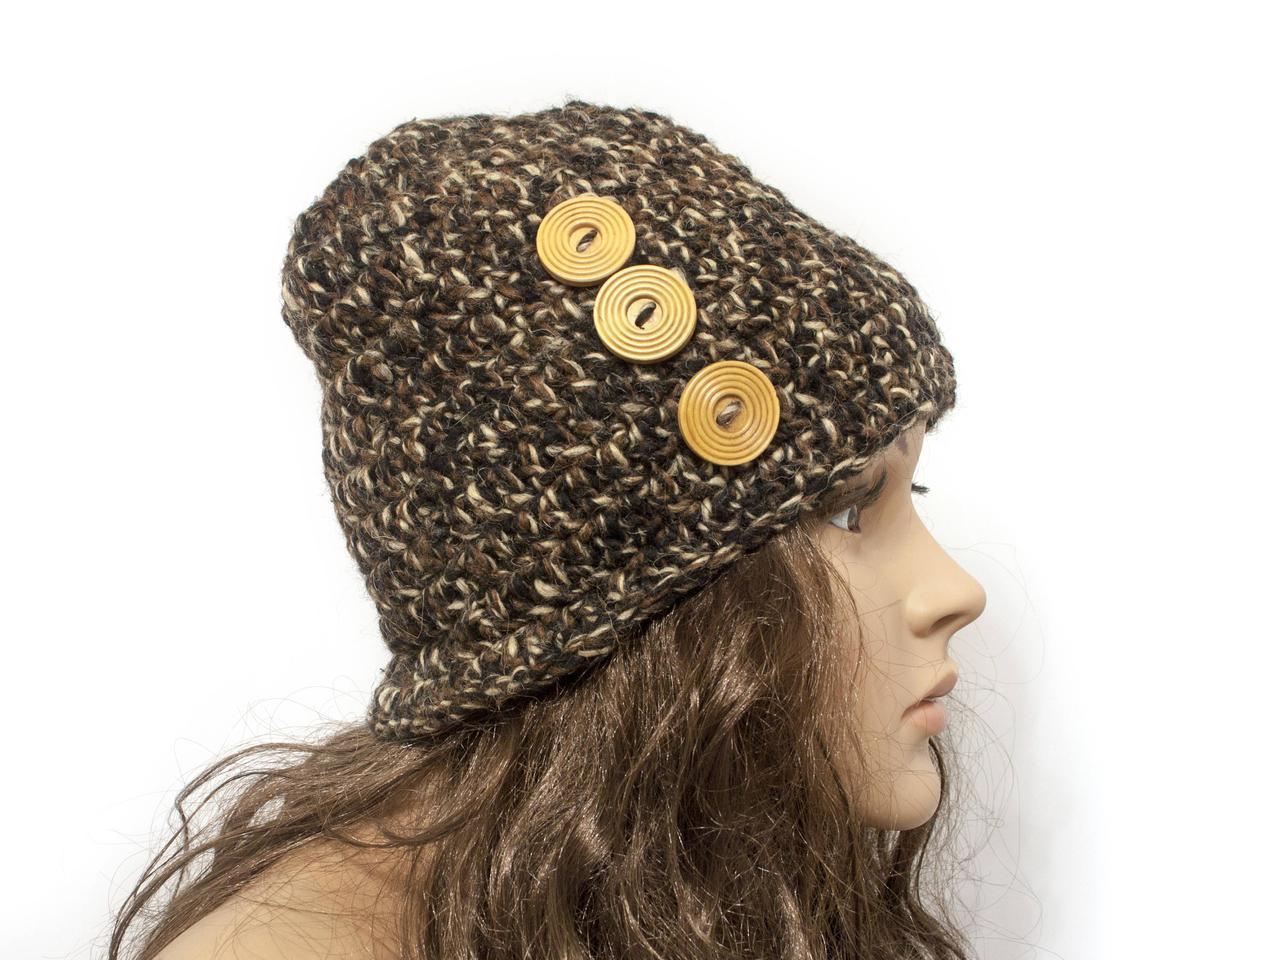 Шапка, женская вязаная шапка, HandMade шапка, модная стильная шапка